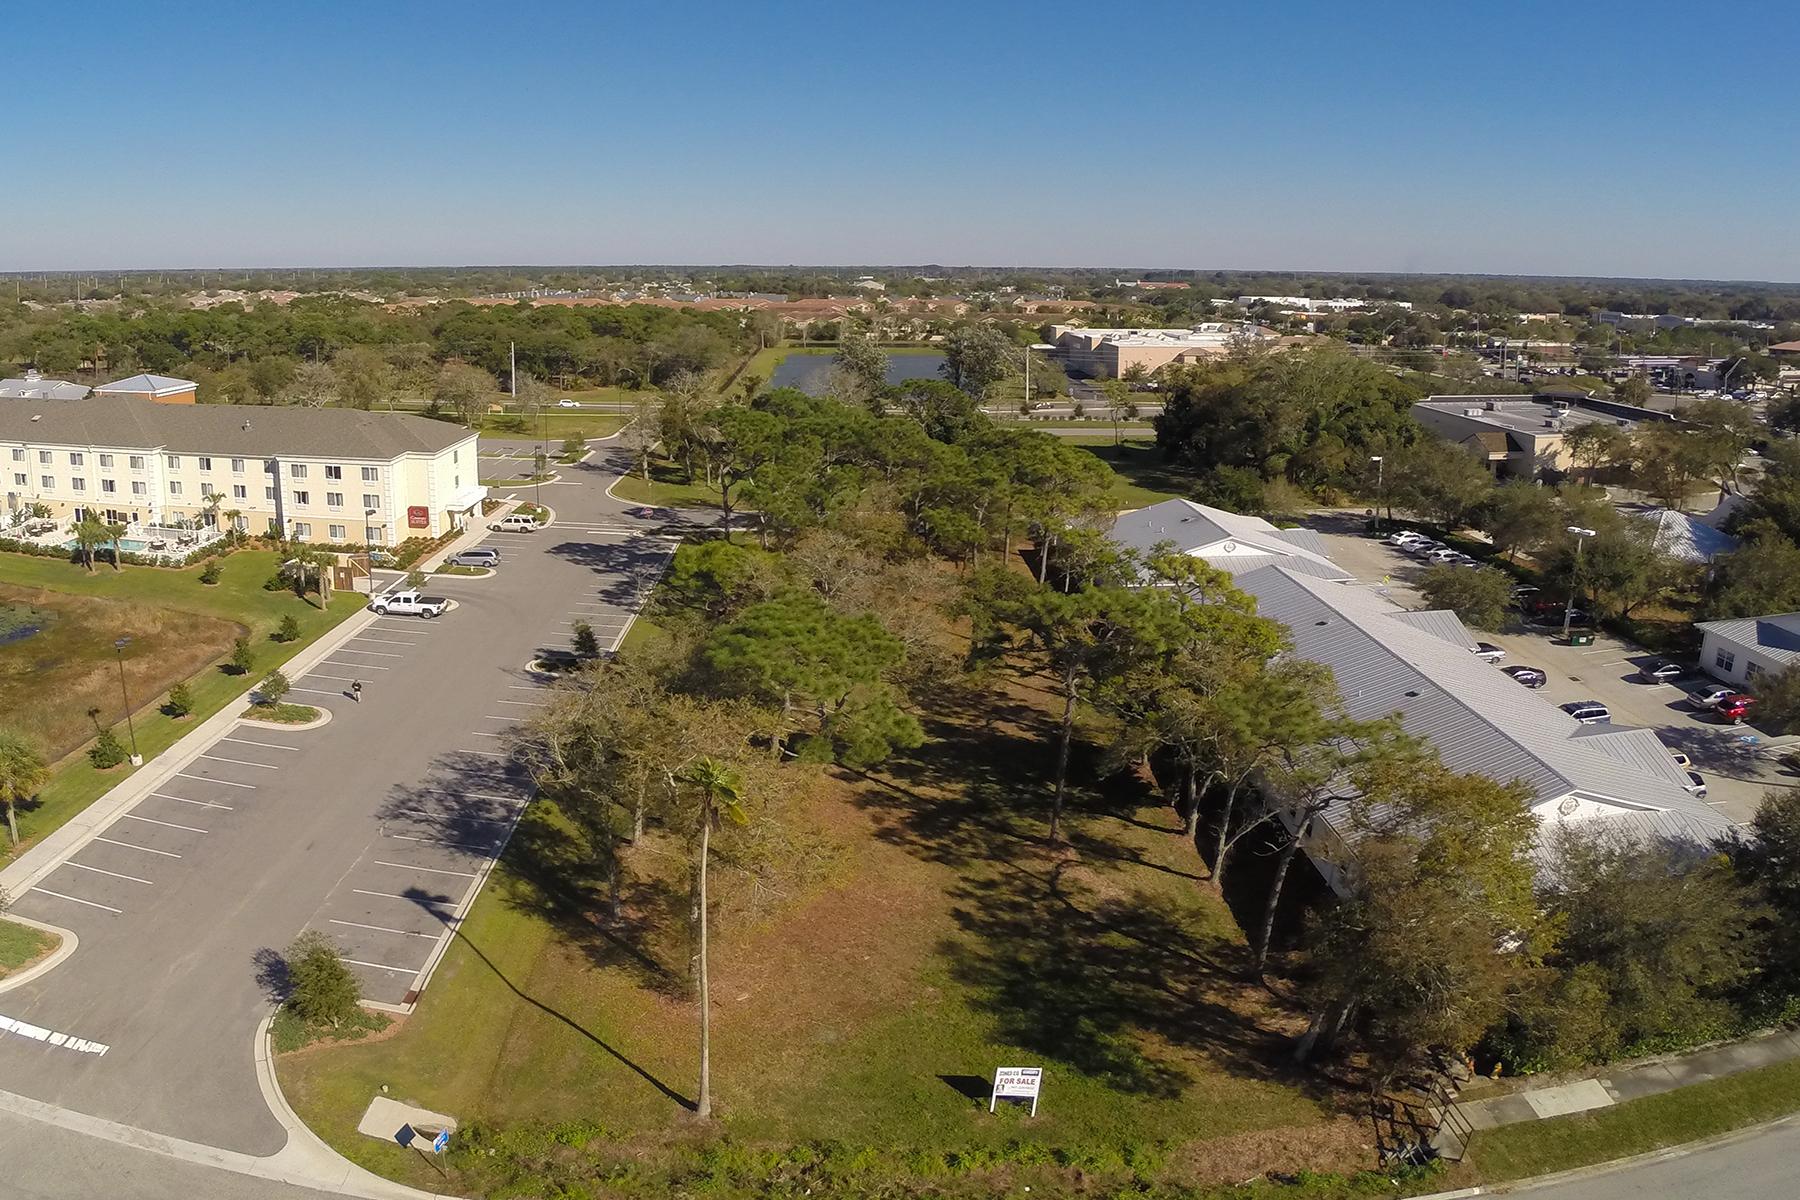 Land for Sale at RIDGECREST 5706 Mead Ave 3 Sarasota, Florida, 34233 United States